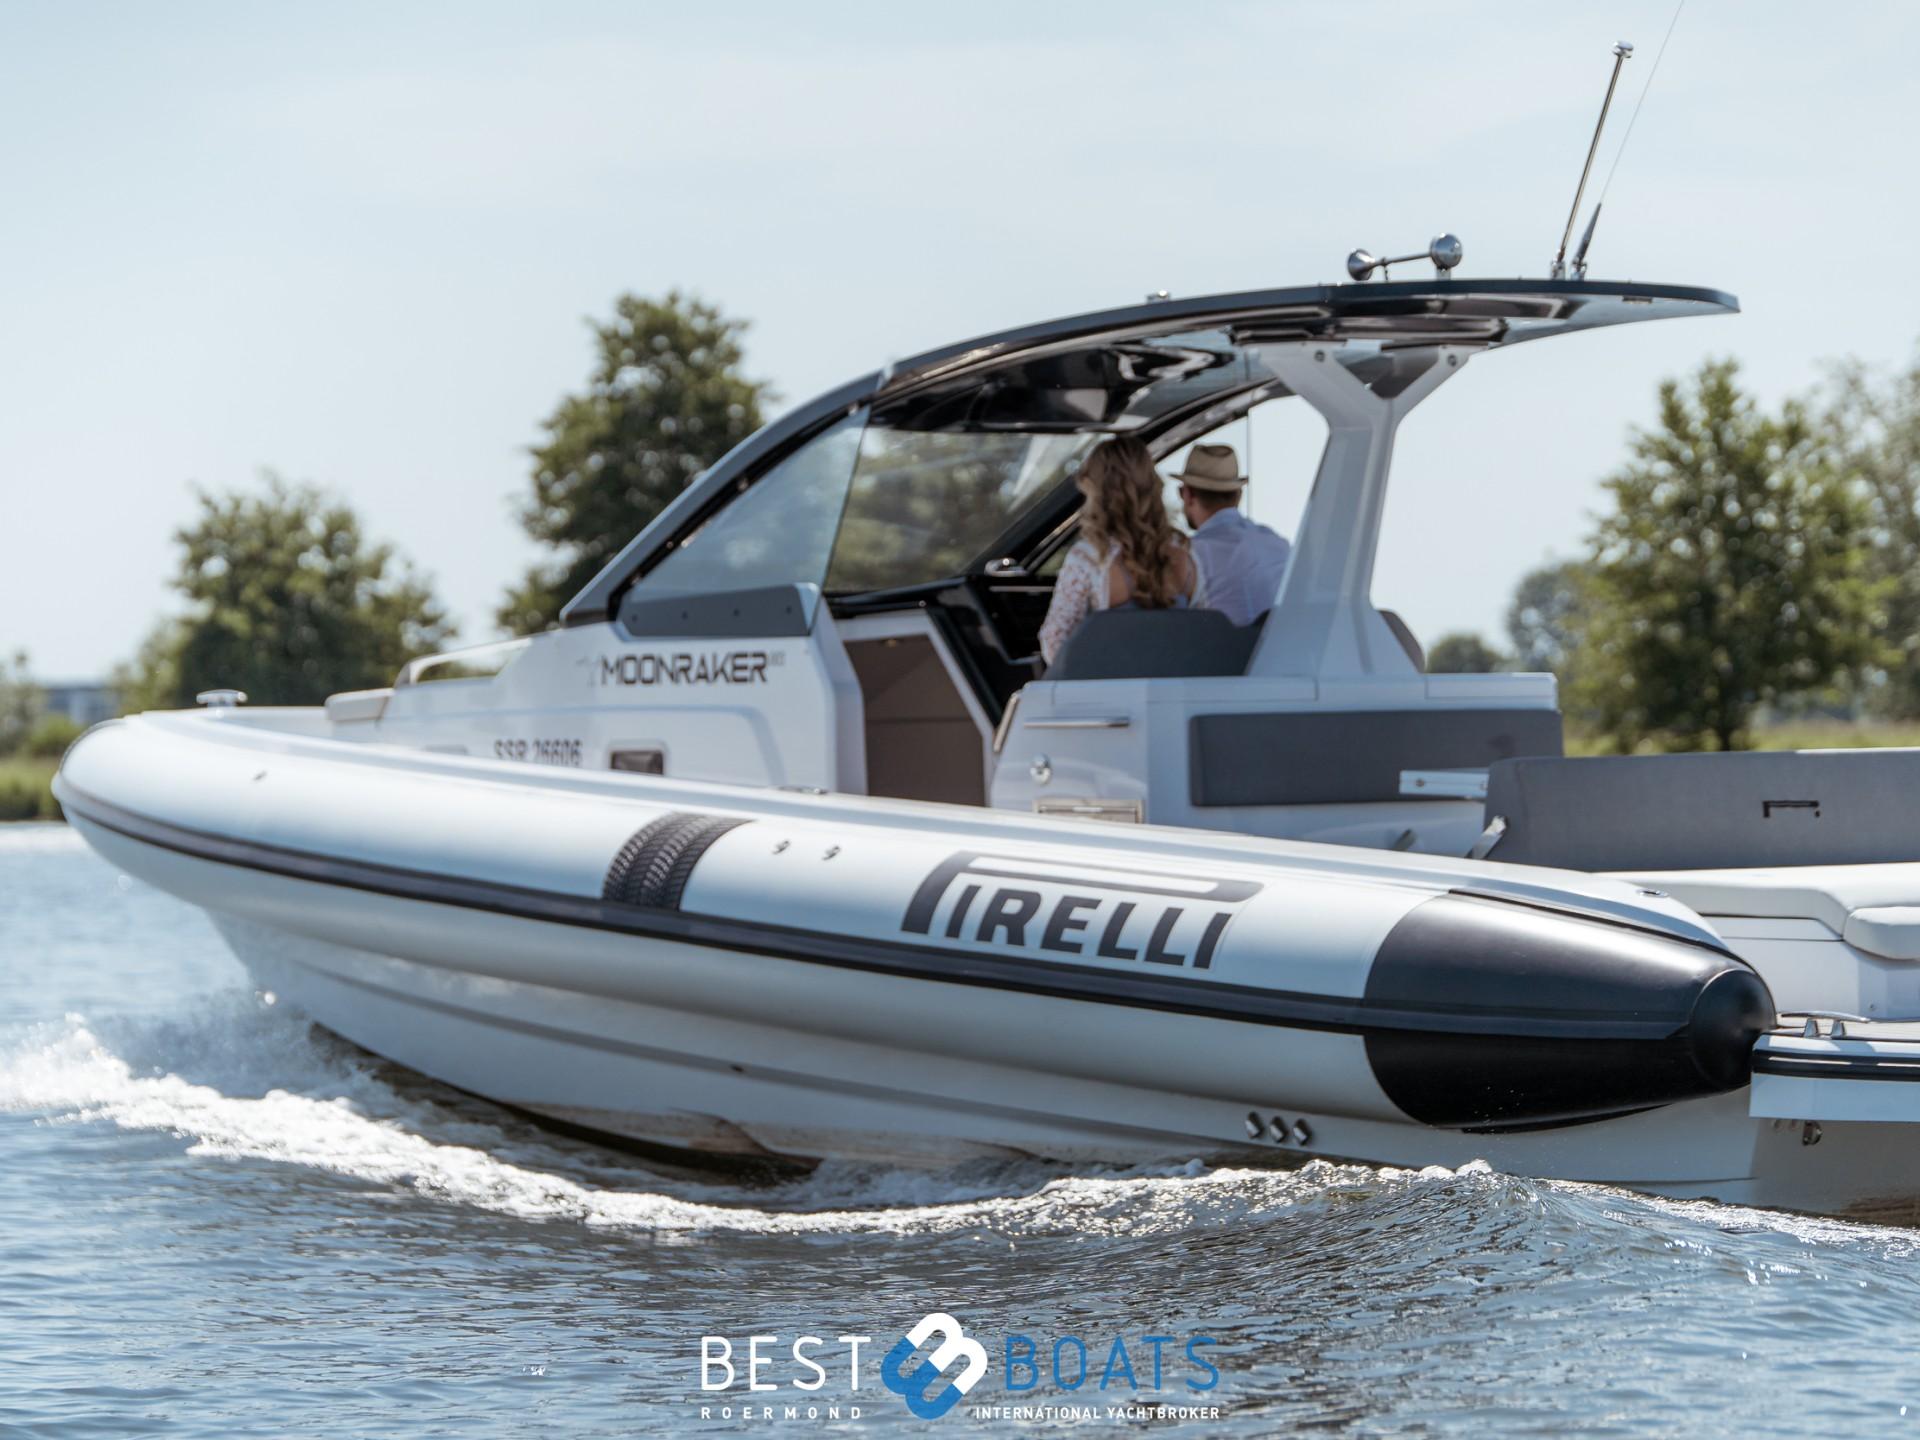 PIRELLI Speedboats 35